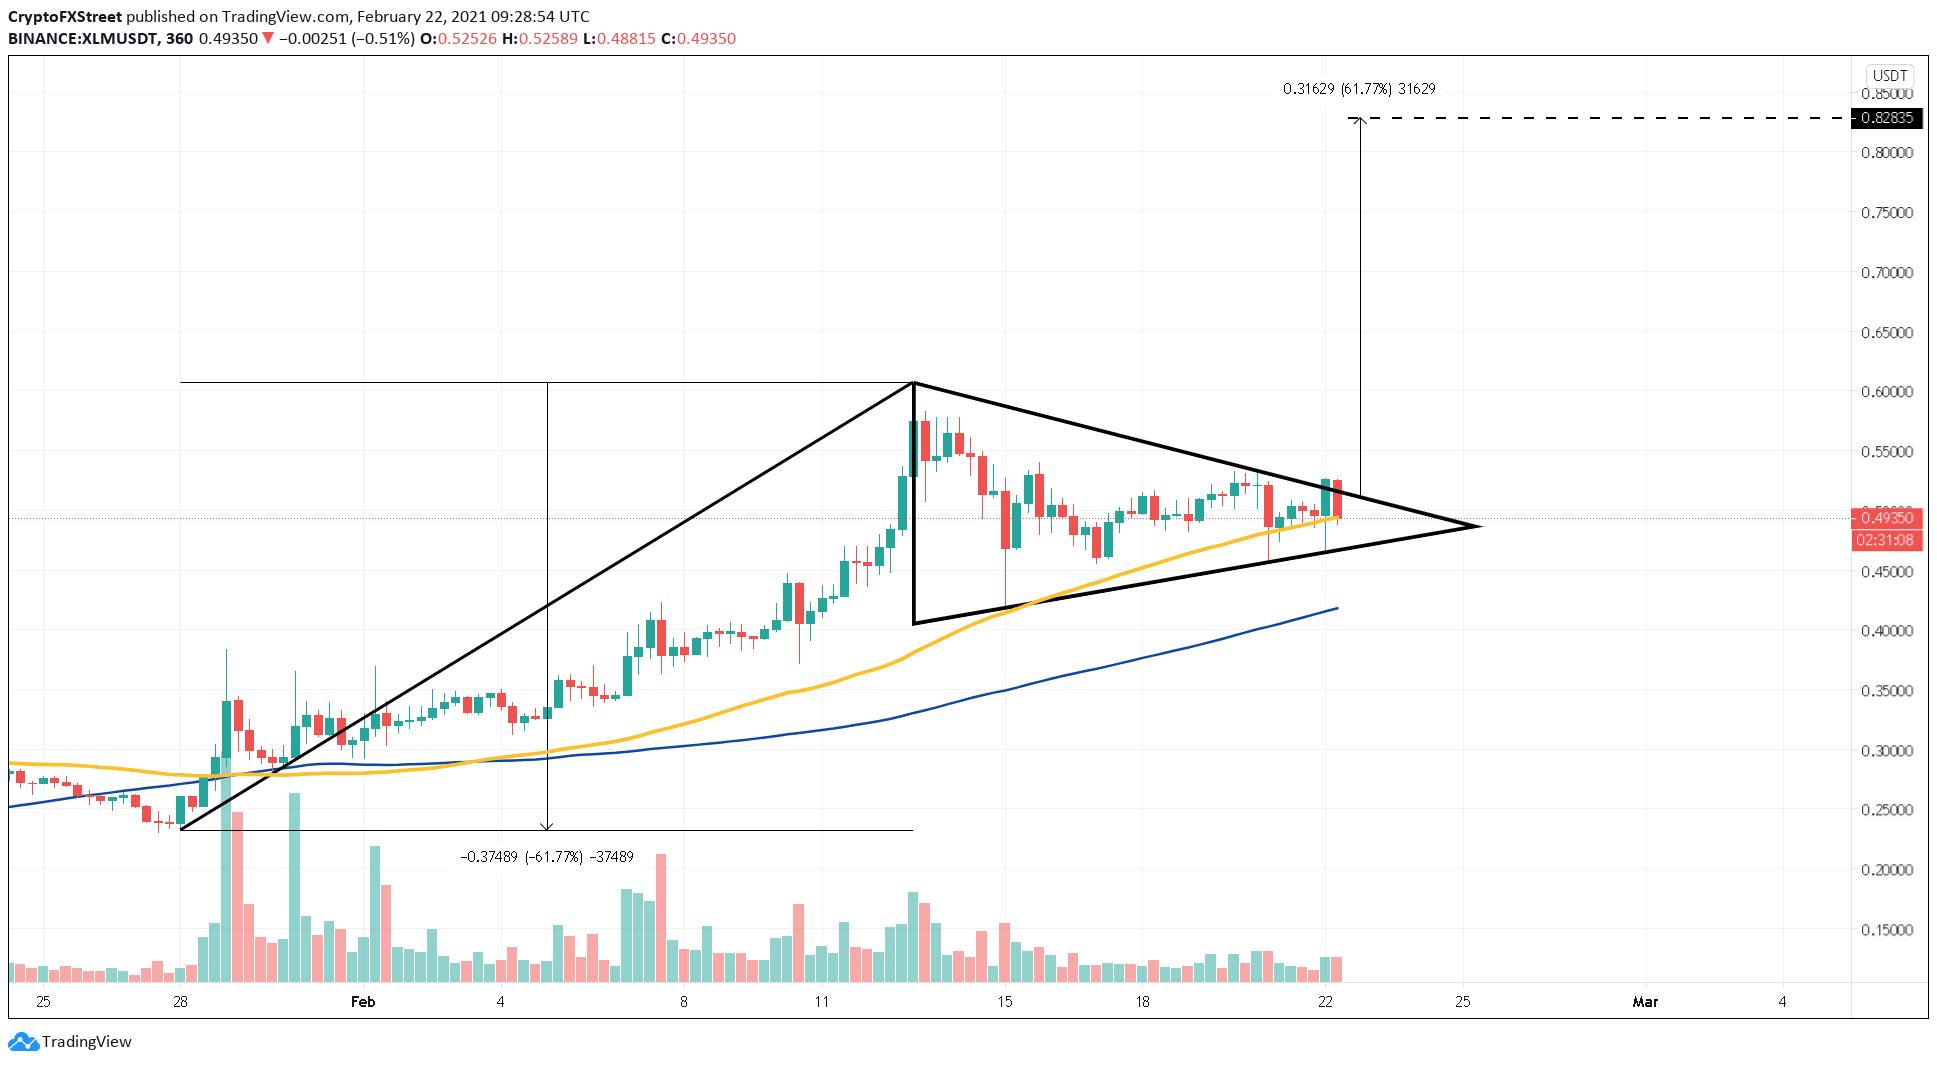 XLM/USDT 6-hour chart